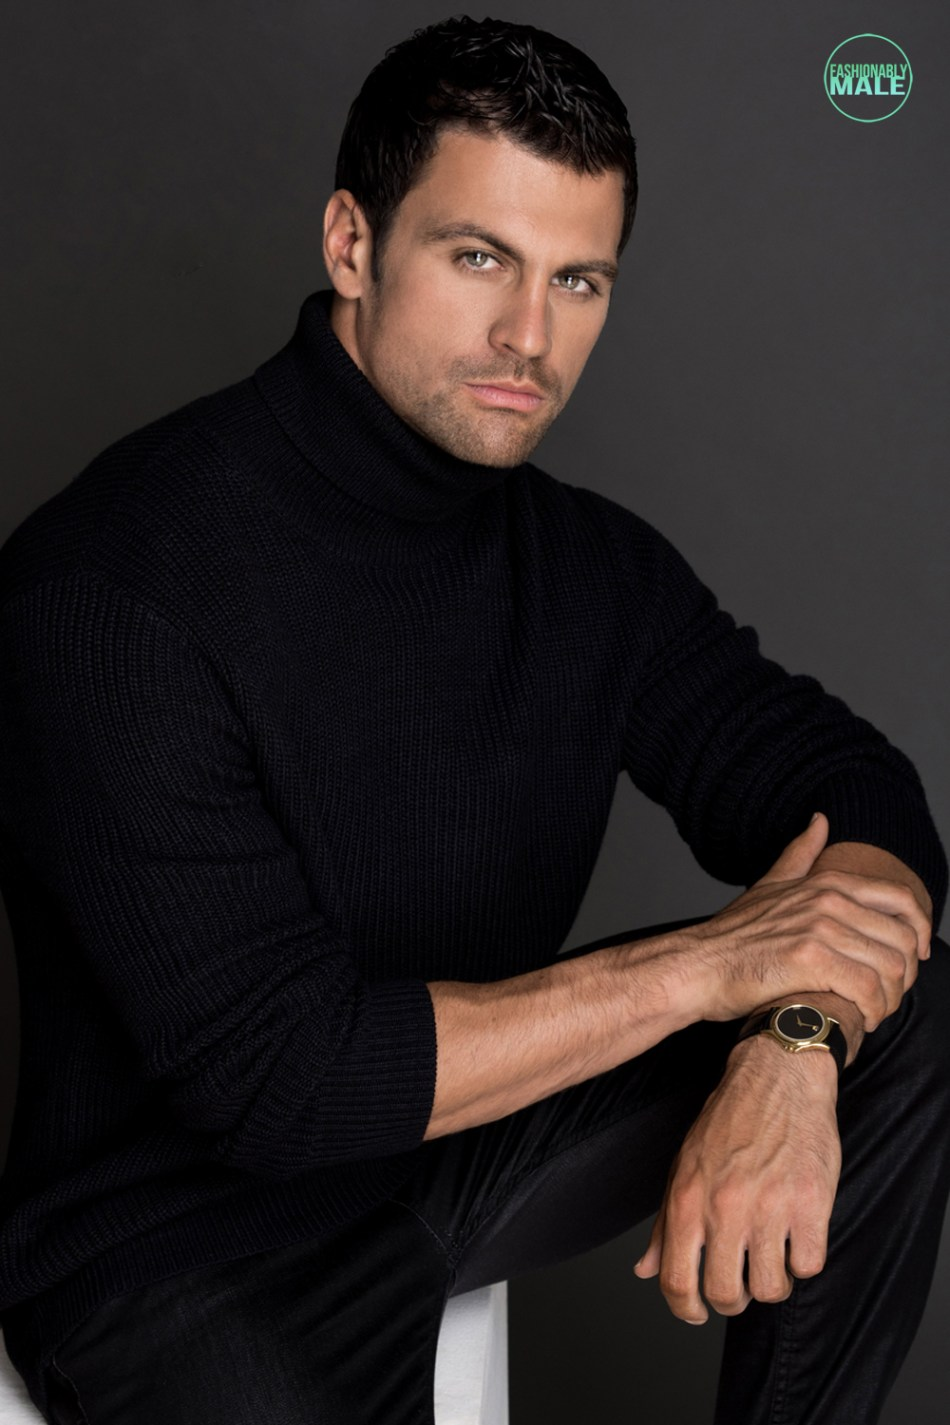 Michael J Scanlon for FashionablyMale (3)